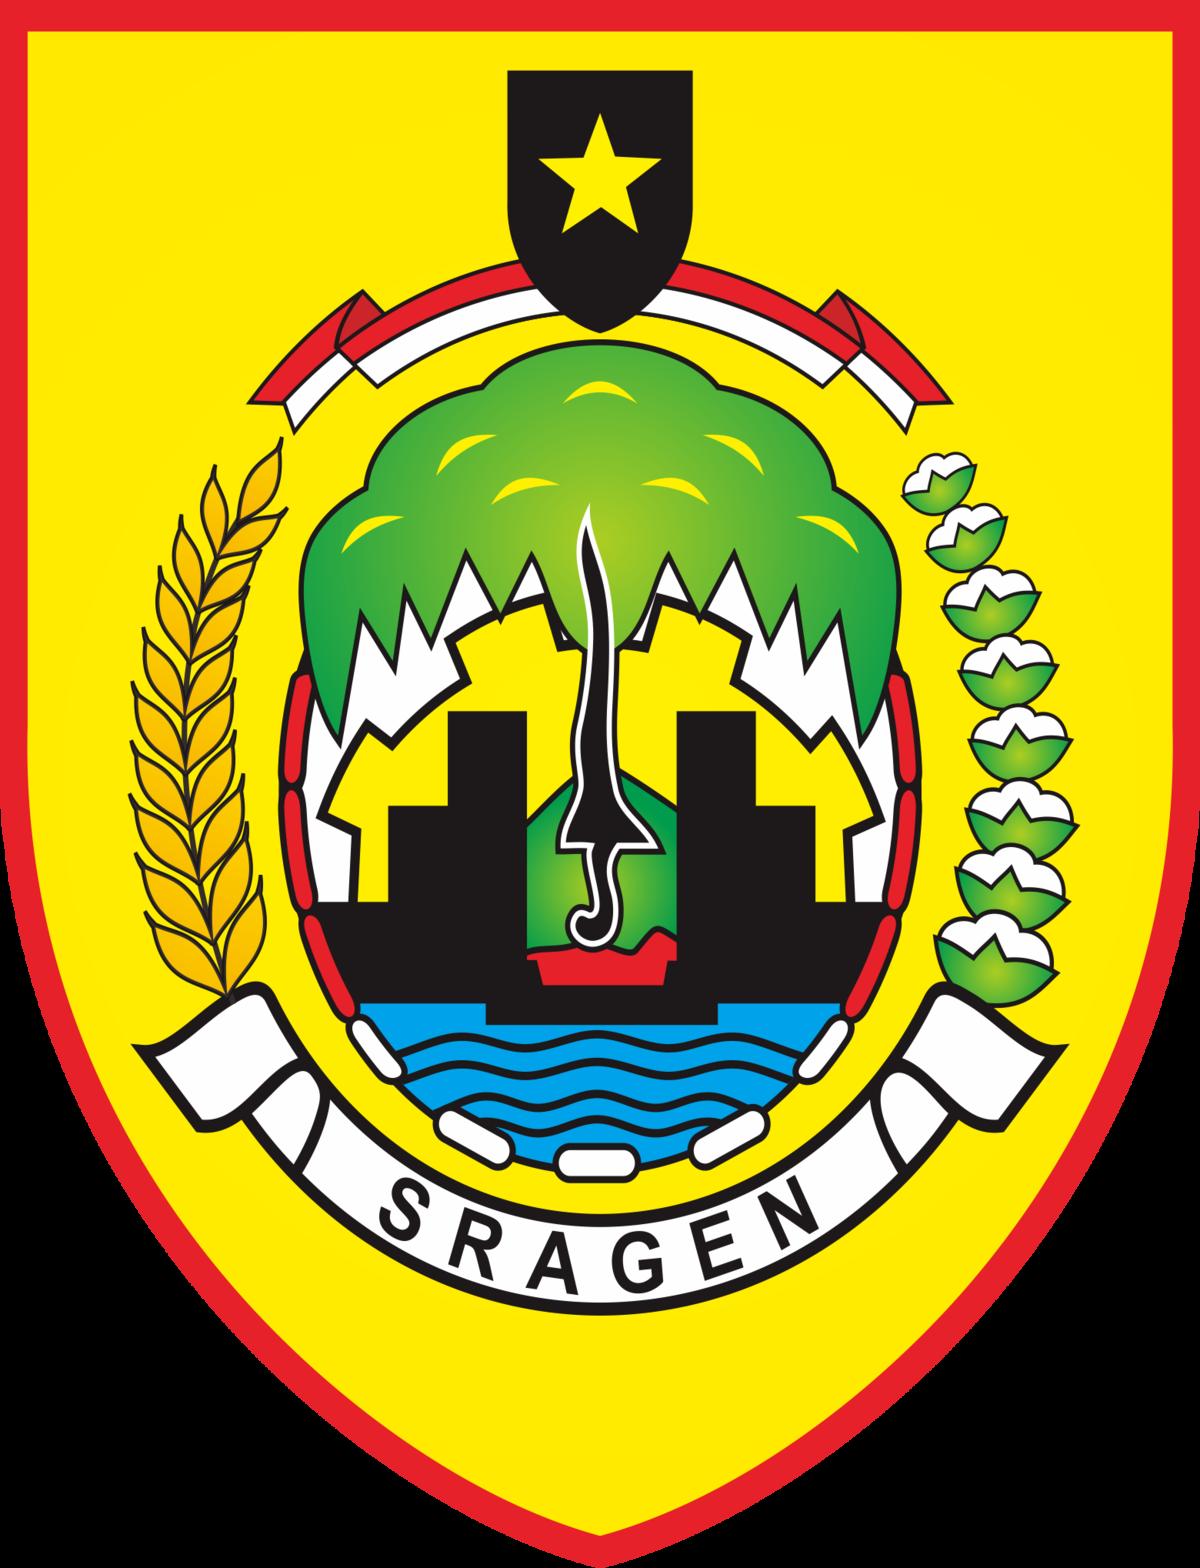 Kabupaten Sragen Wikipedia Bahasa Indonesia Ensiklopedia Bebas Wisata Ganesha Technopark